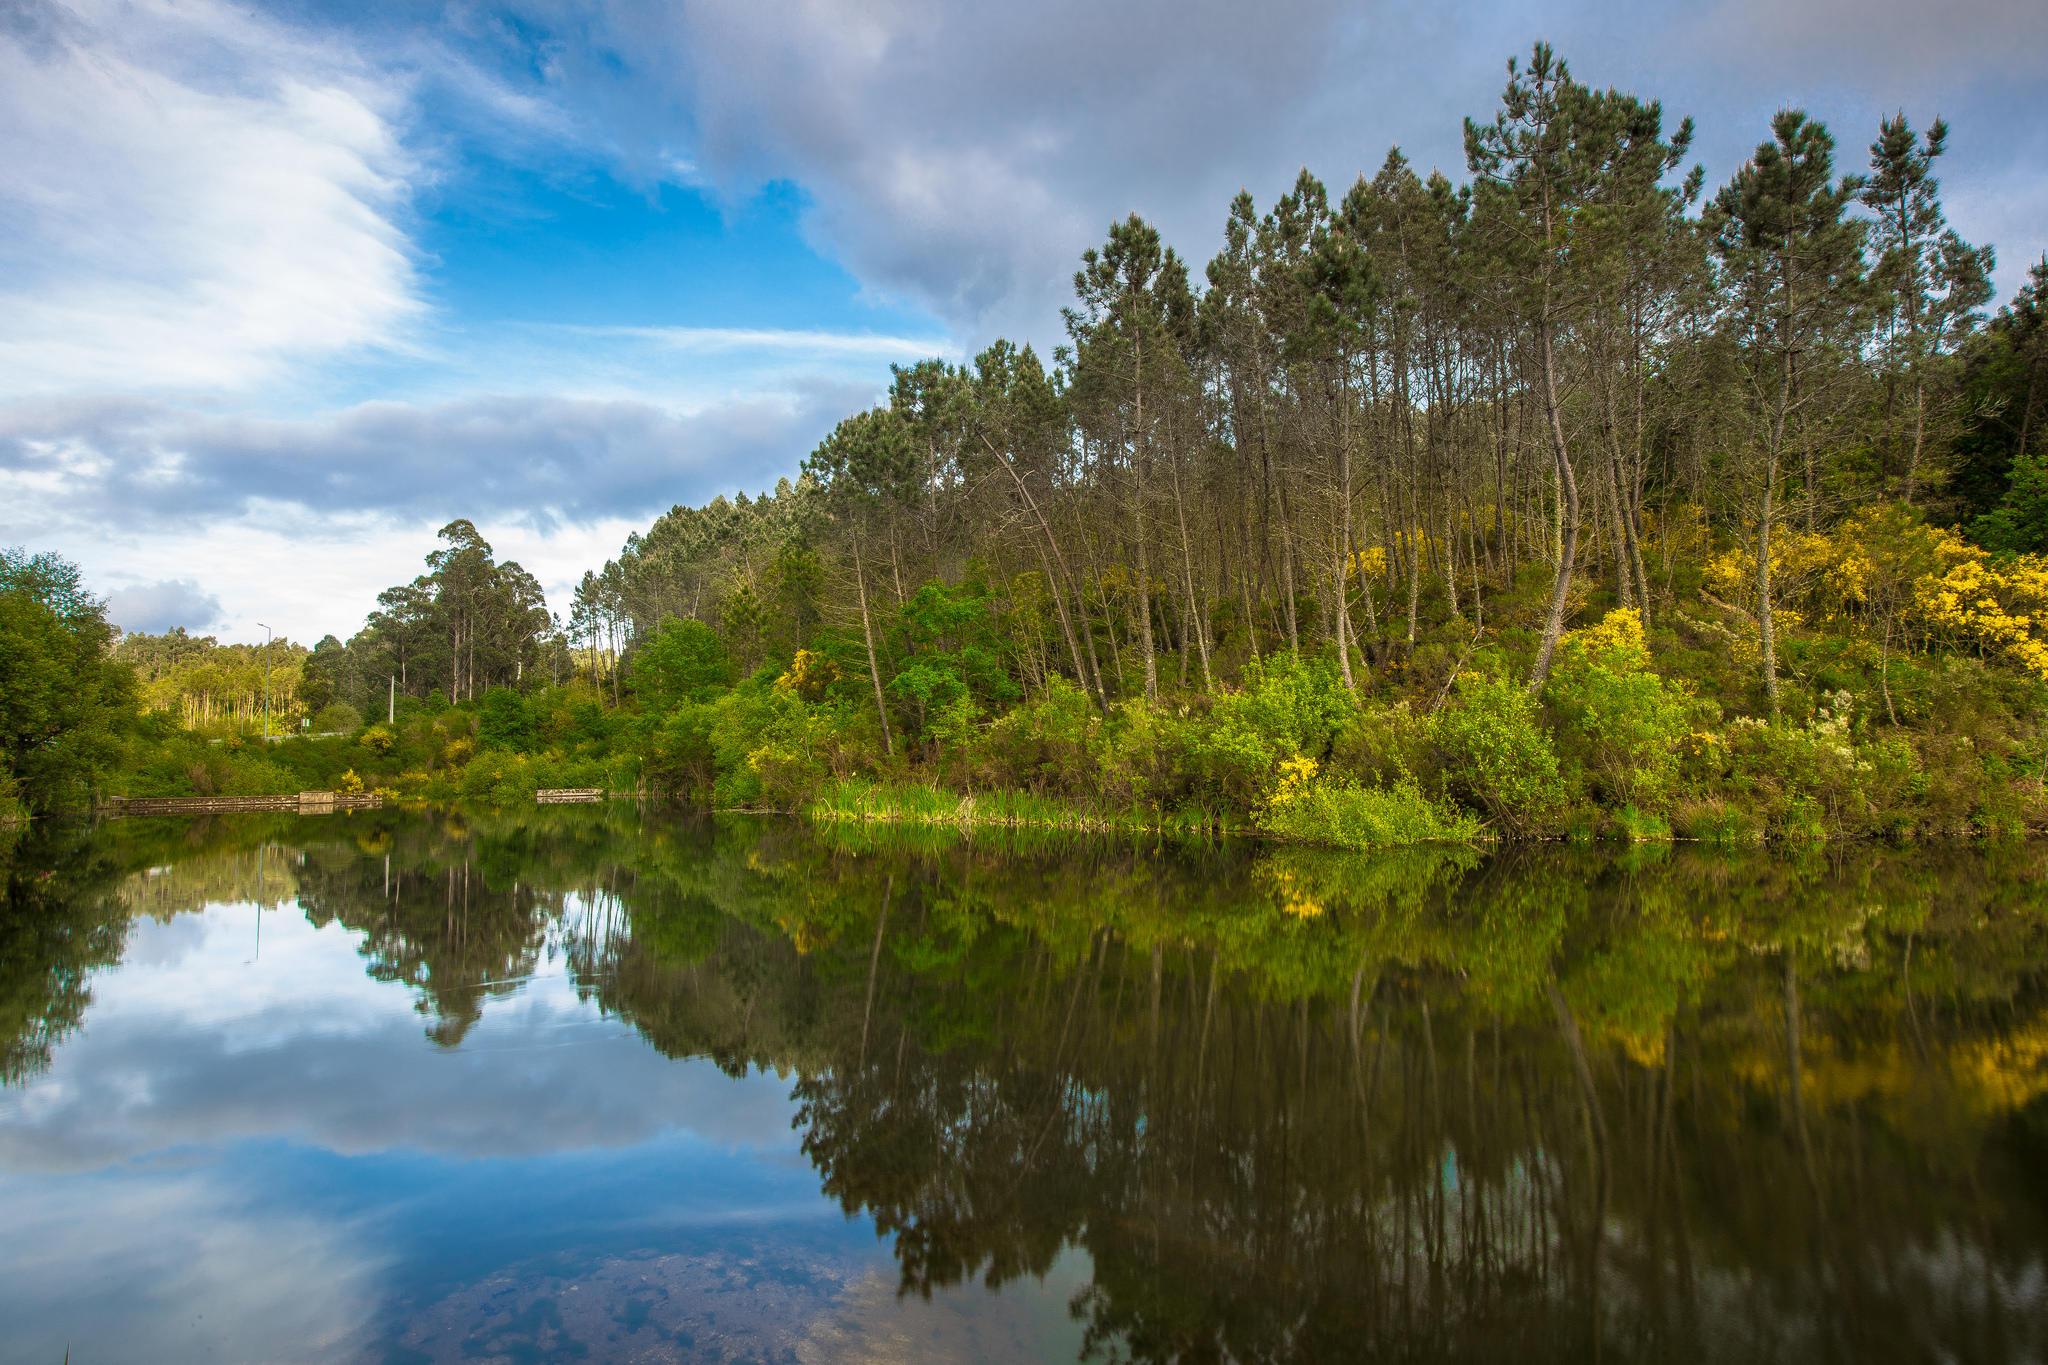 обои озеро, лес, деревья, пейзаж картинки фото